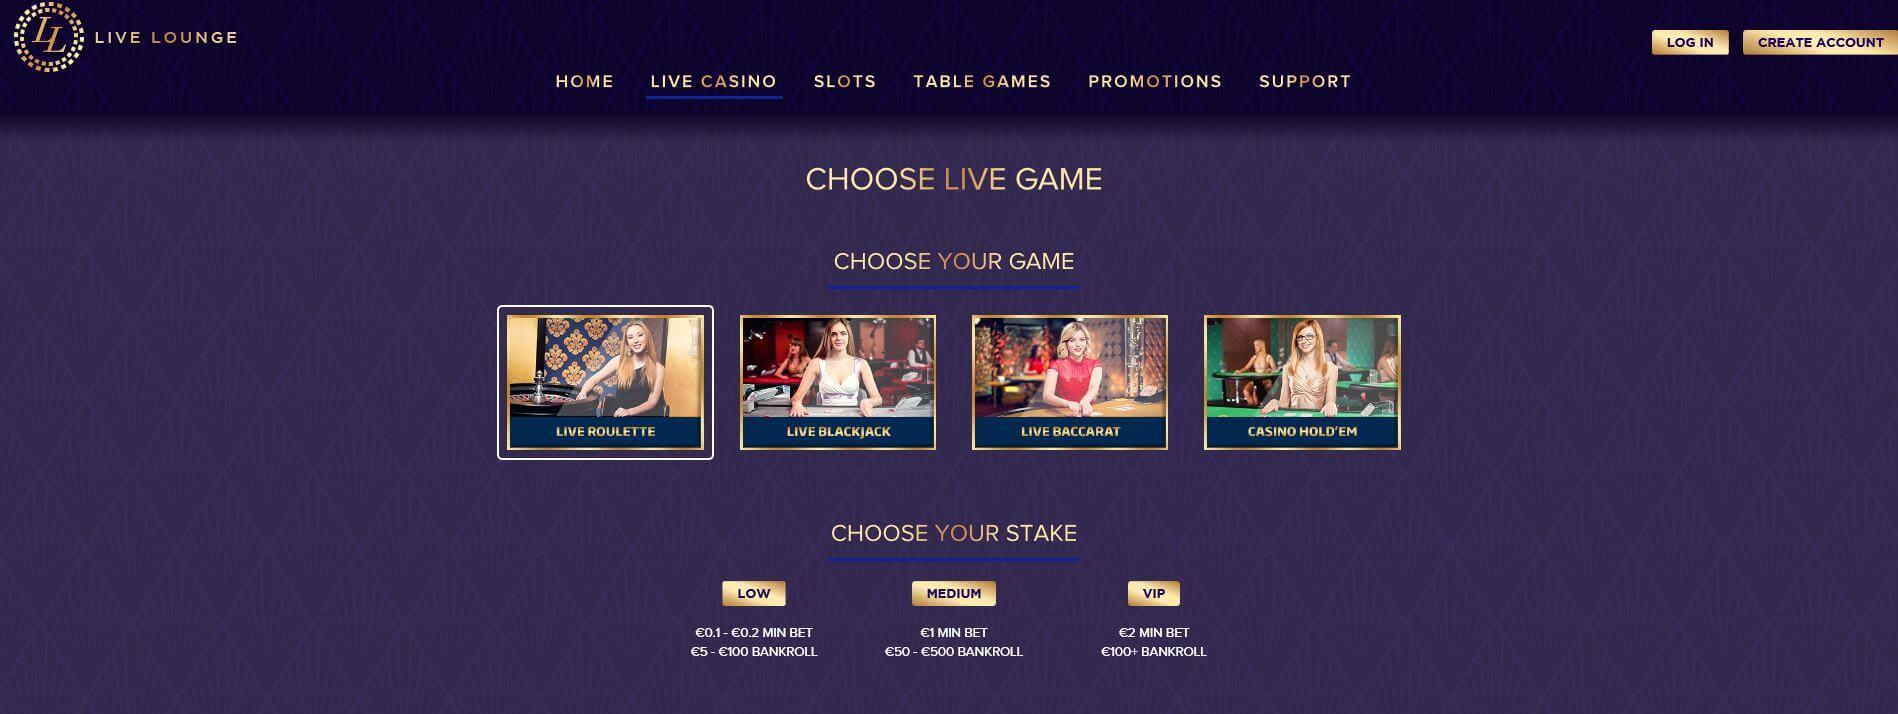 Live Lounge Casino Live Casino